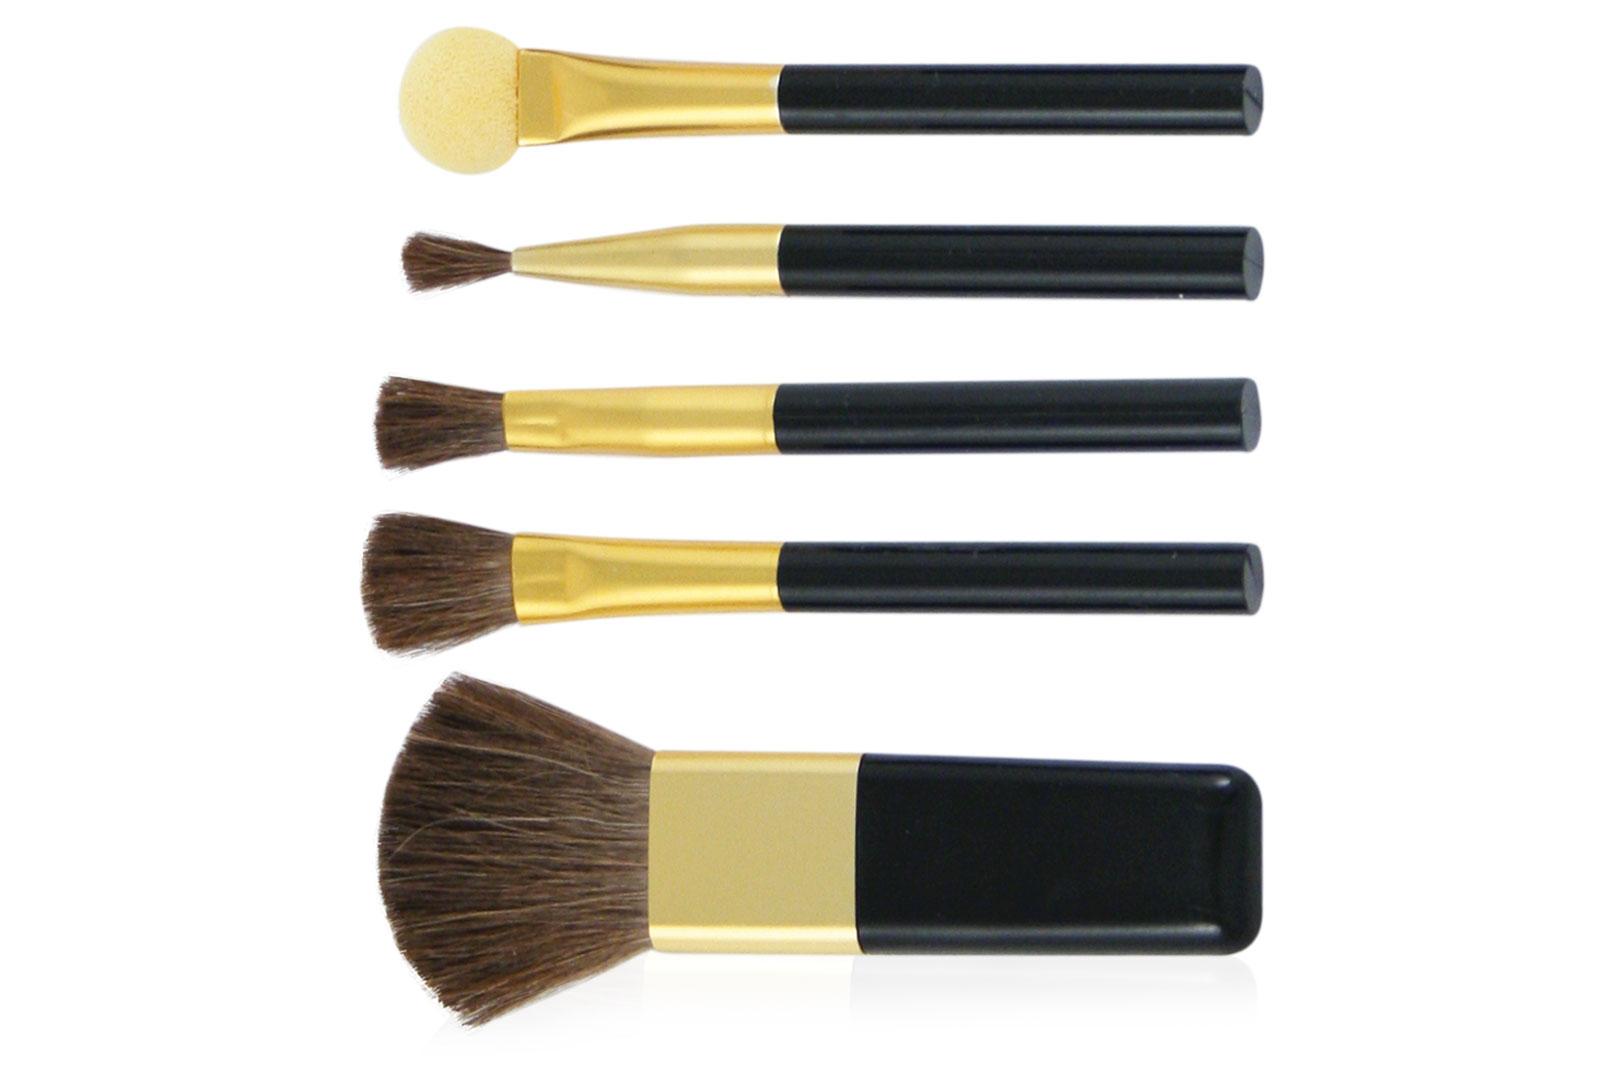 Набор кистей для макияжа, 5 предметов